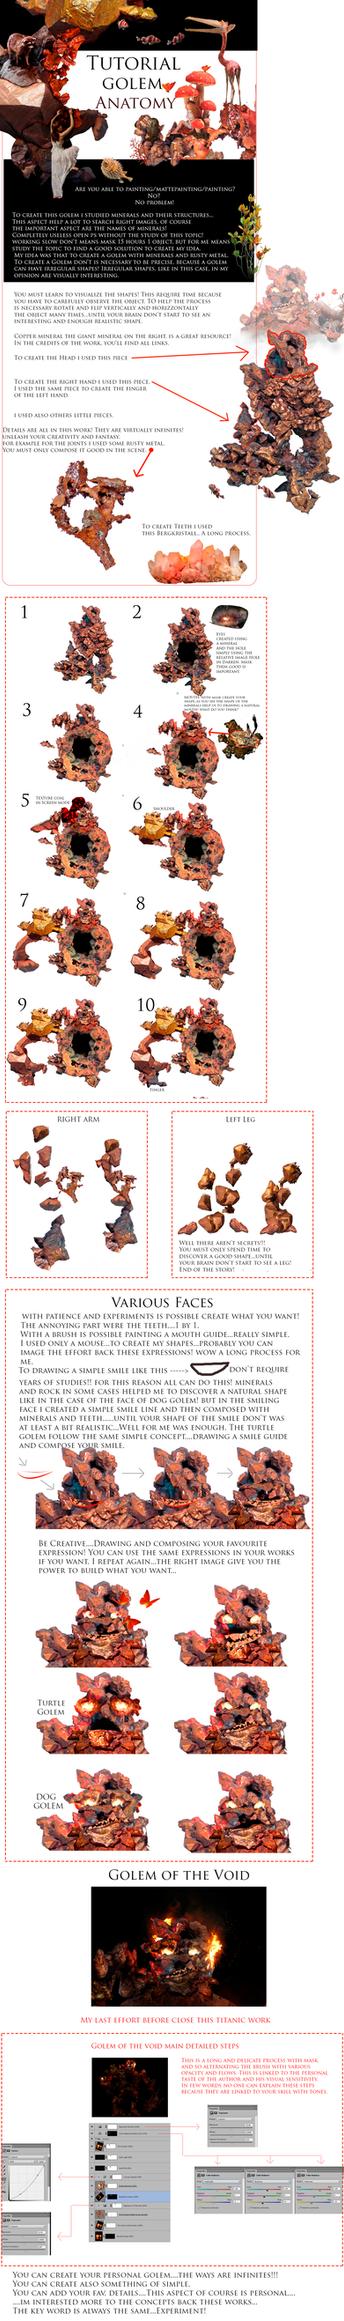 Tutorial Golem Anatomy by DraakeT by DraakeT